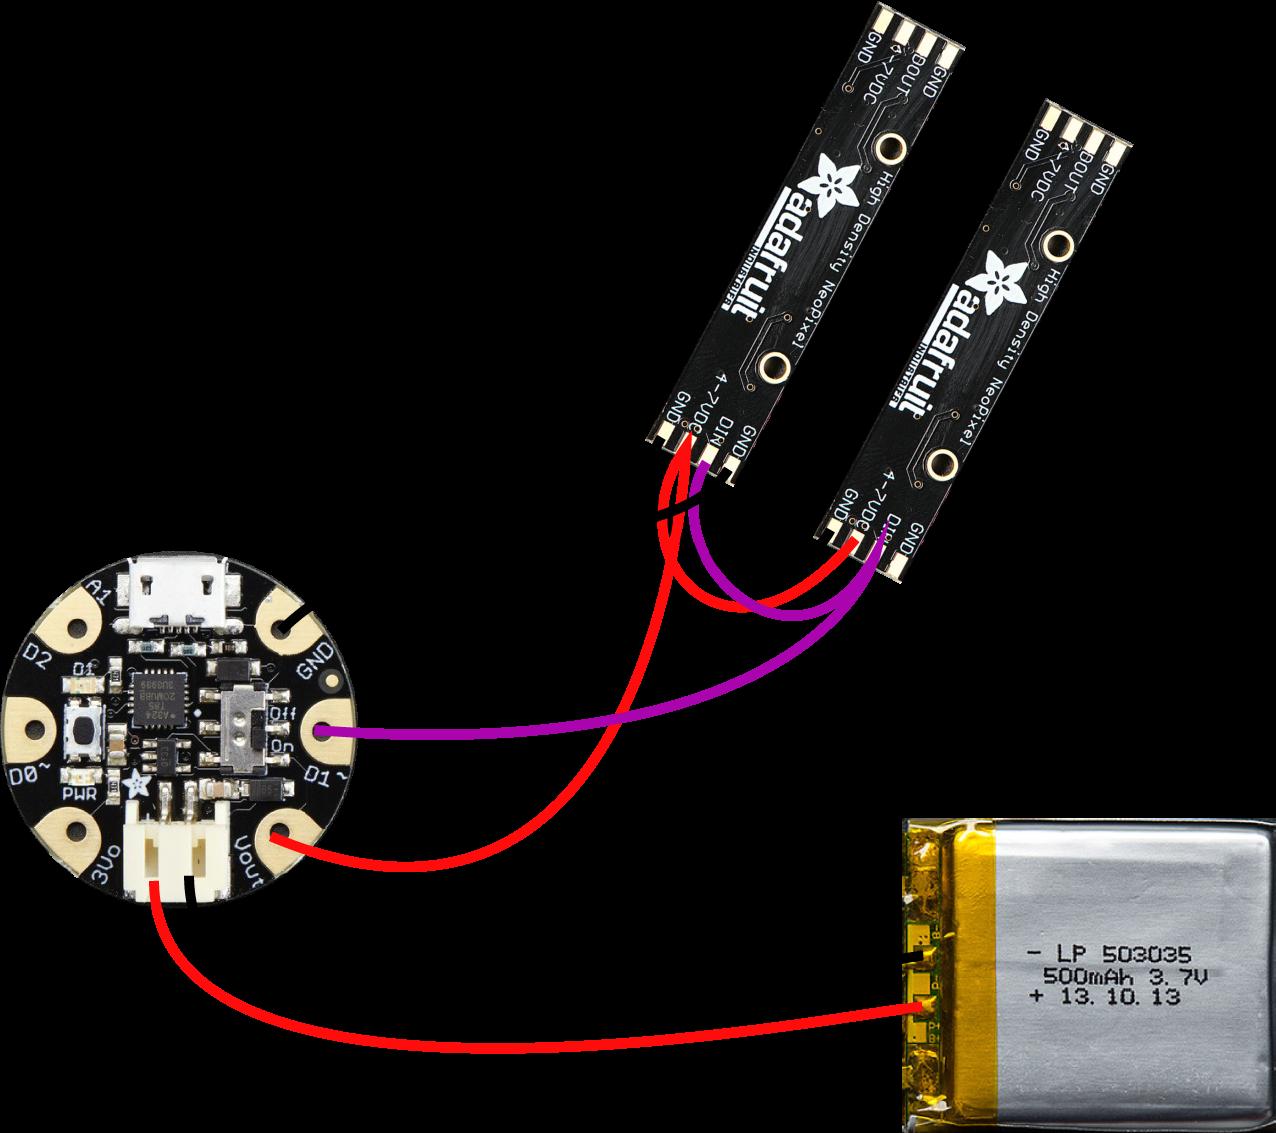 led_pixels_unicorn-diagram.png